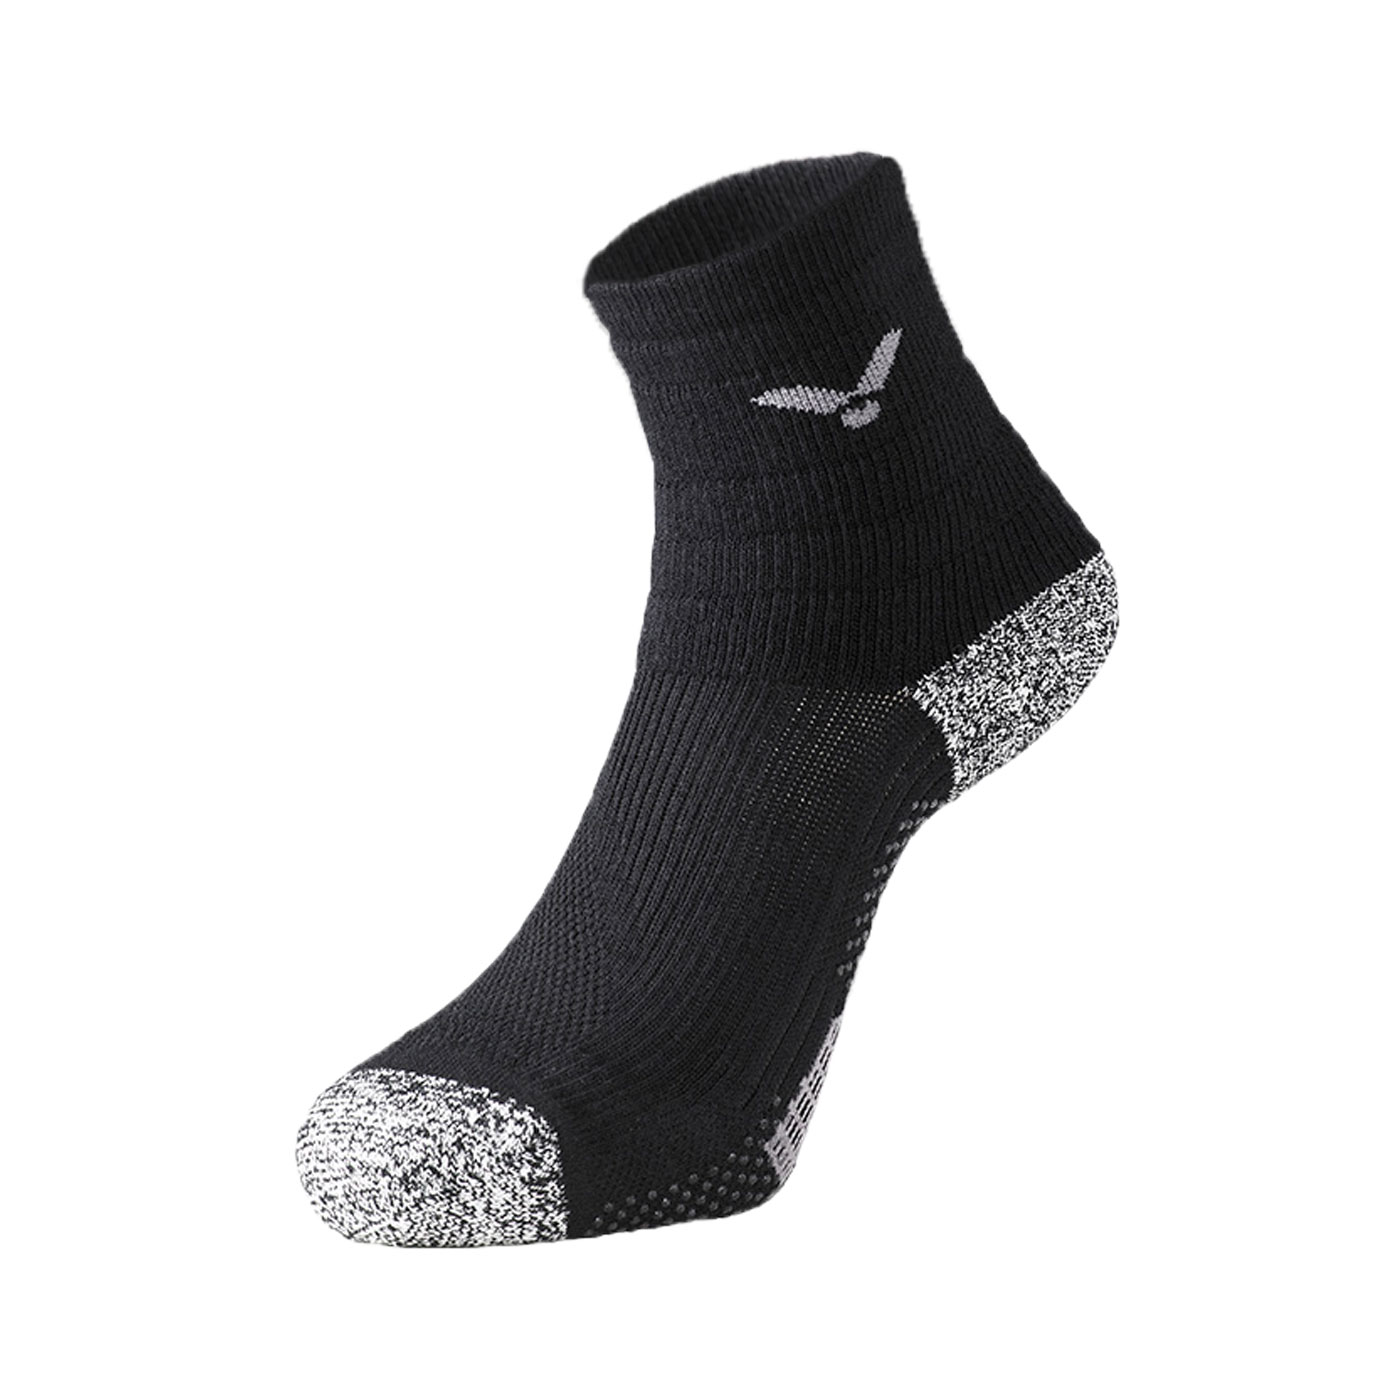 VICTOR 抗菌消臭機能襪 C-5077C - 黑灰